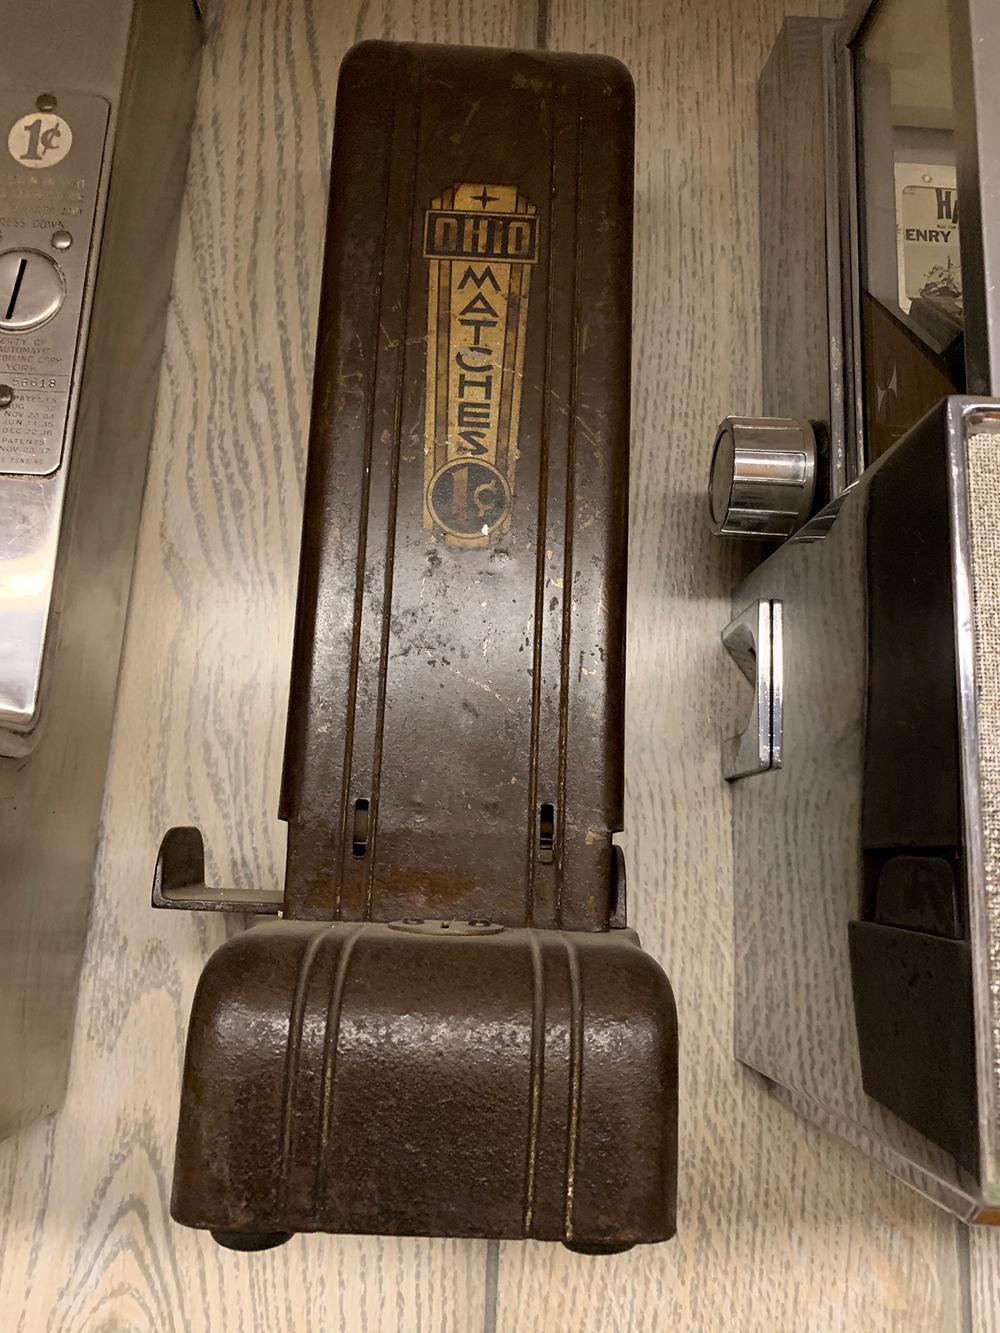 Vintage Ohio Matches Vending Machine